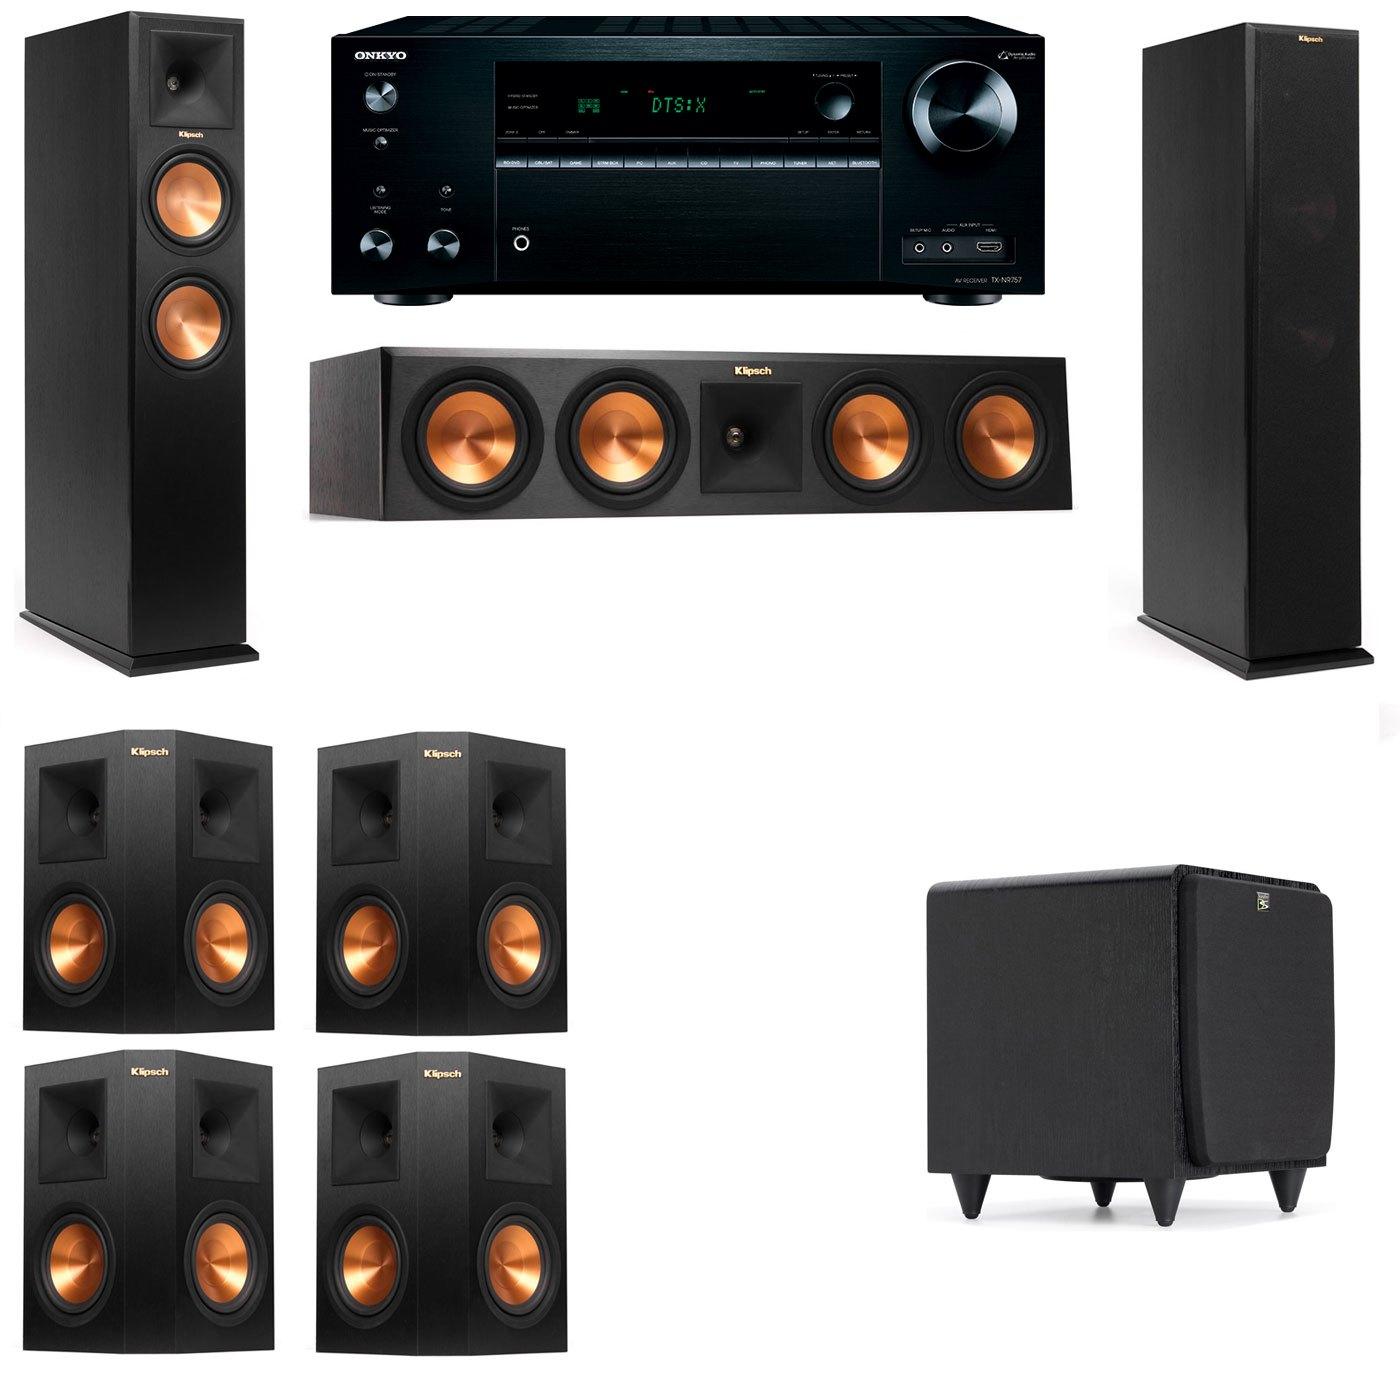 Klipsch RP-250F Tower Speakers-SDS12-7.1-Onkyo TX-NR757